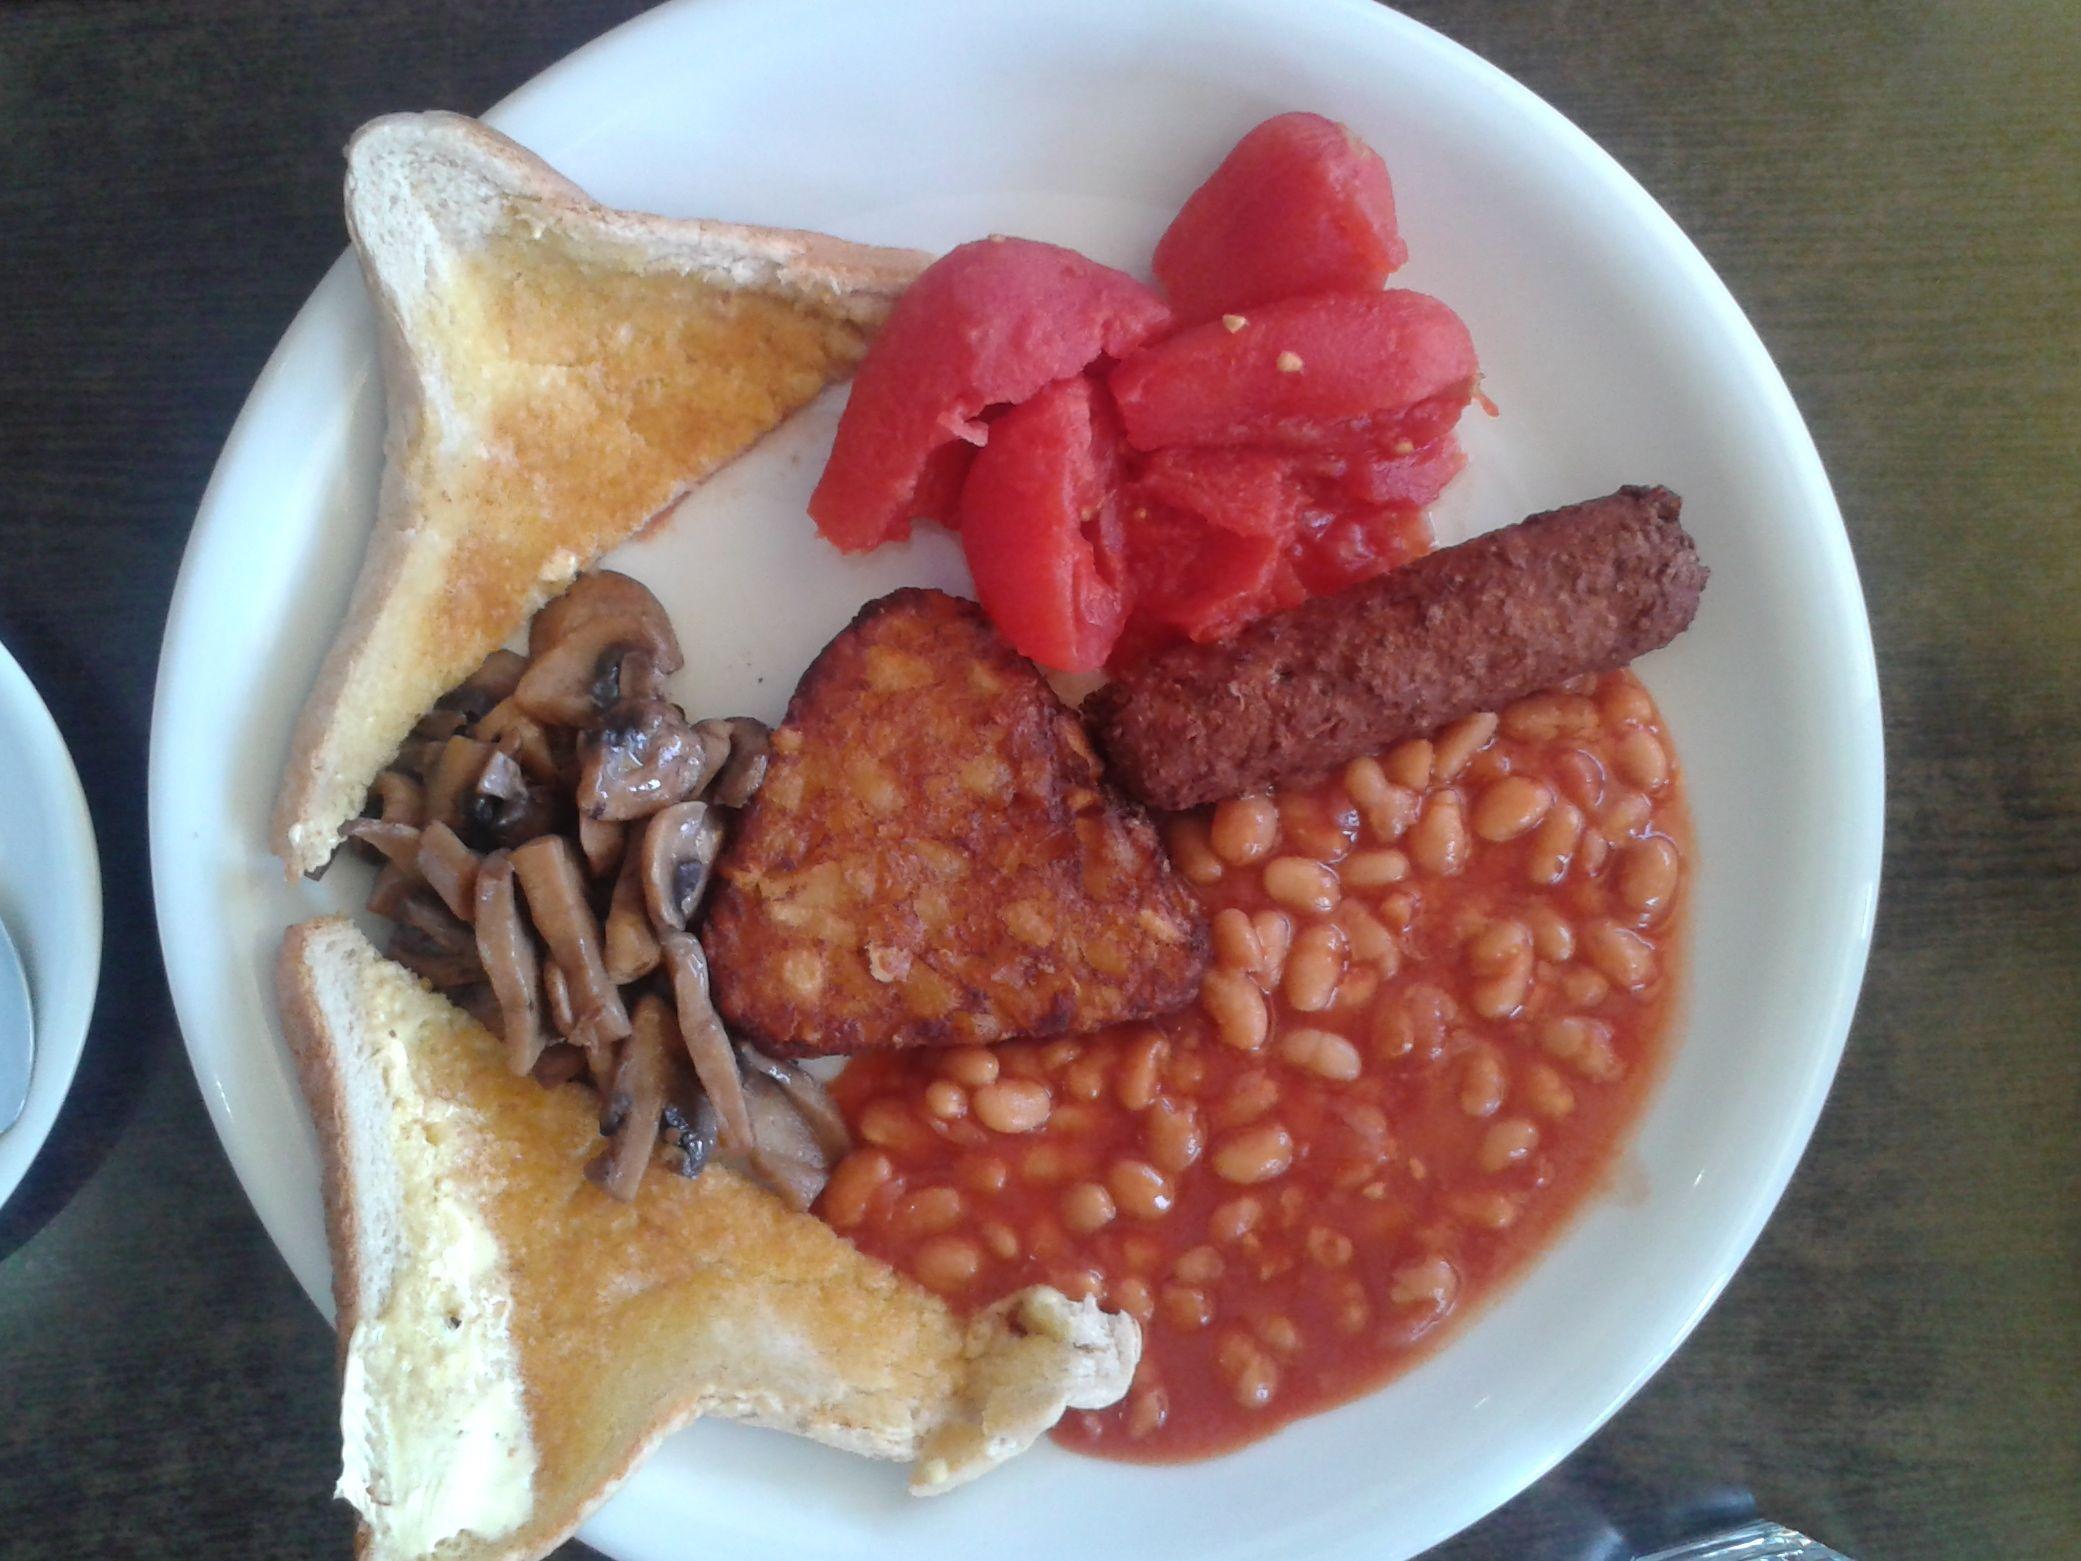 https://i0.wp.com/fatgayvegan.com/wp-content/uploads/2013/07/breakfast.jpg?fit=2081%2C1561